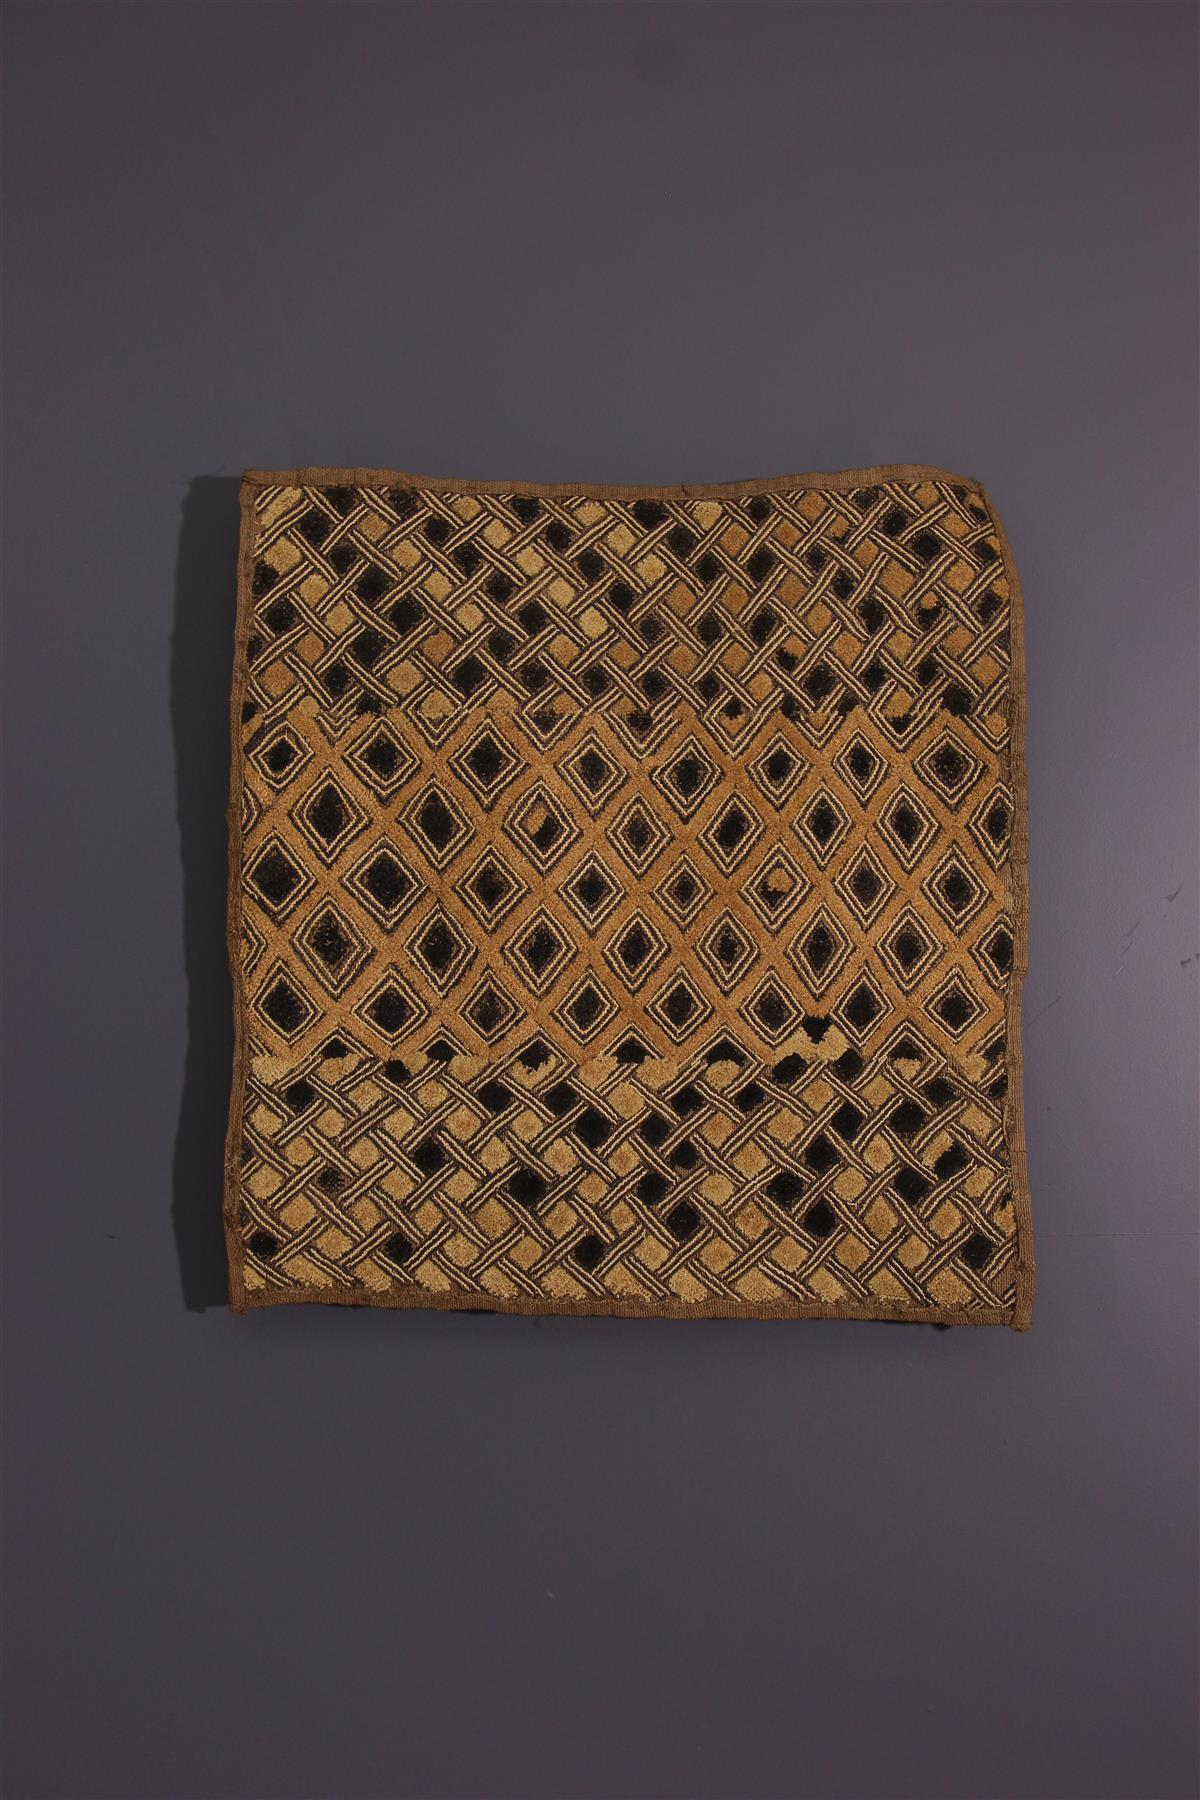 Velours Kuba - African art